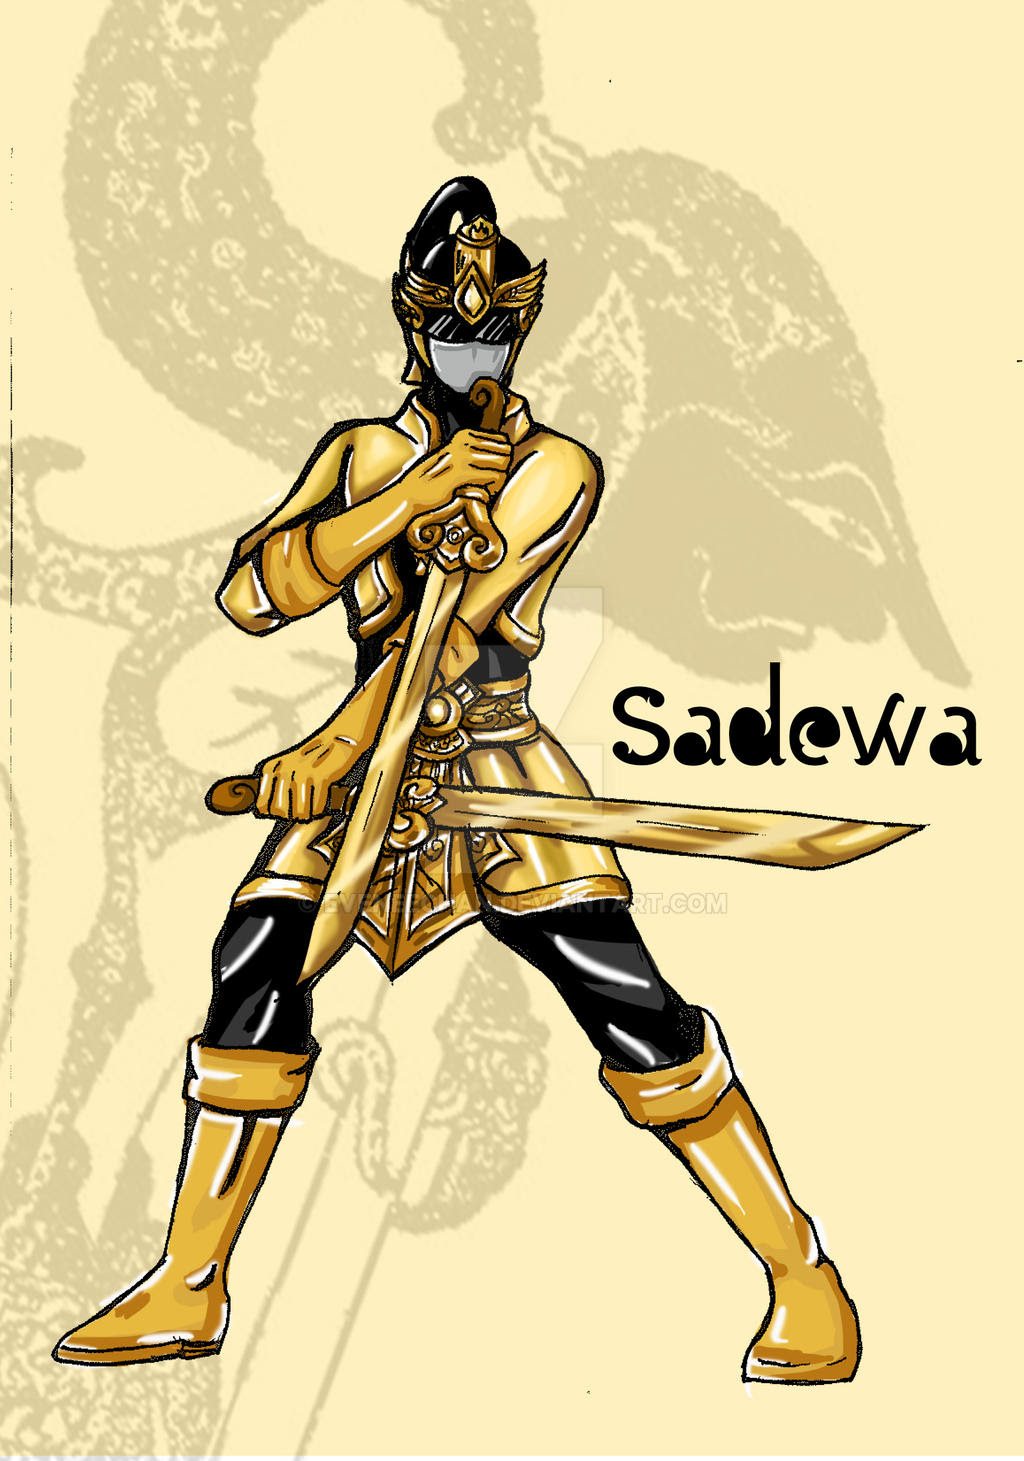 Sadewa The Gold Pandawa Ranger By Eveneechan On Deviantart